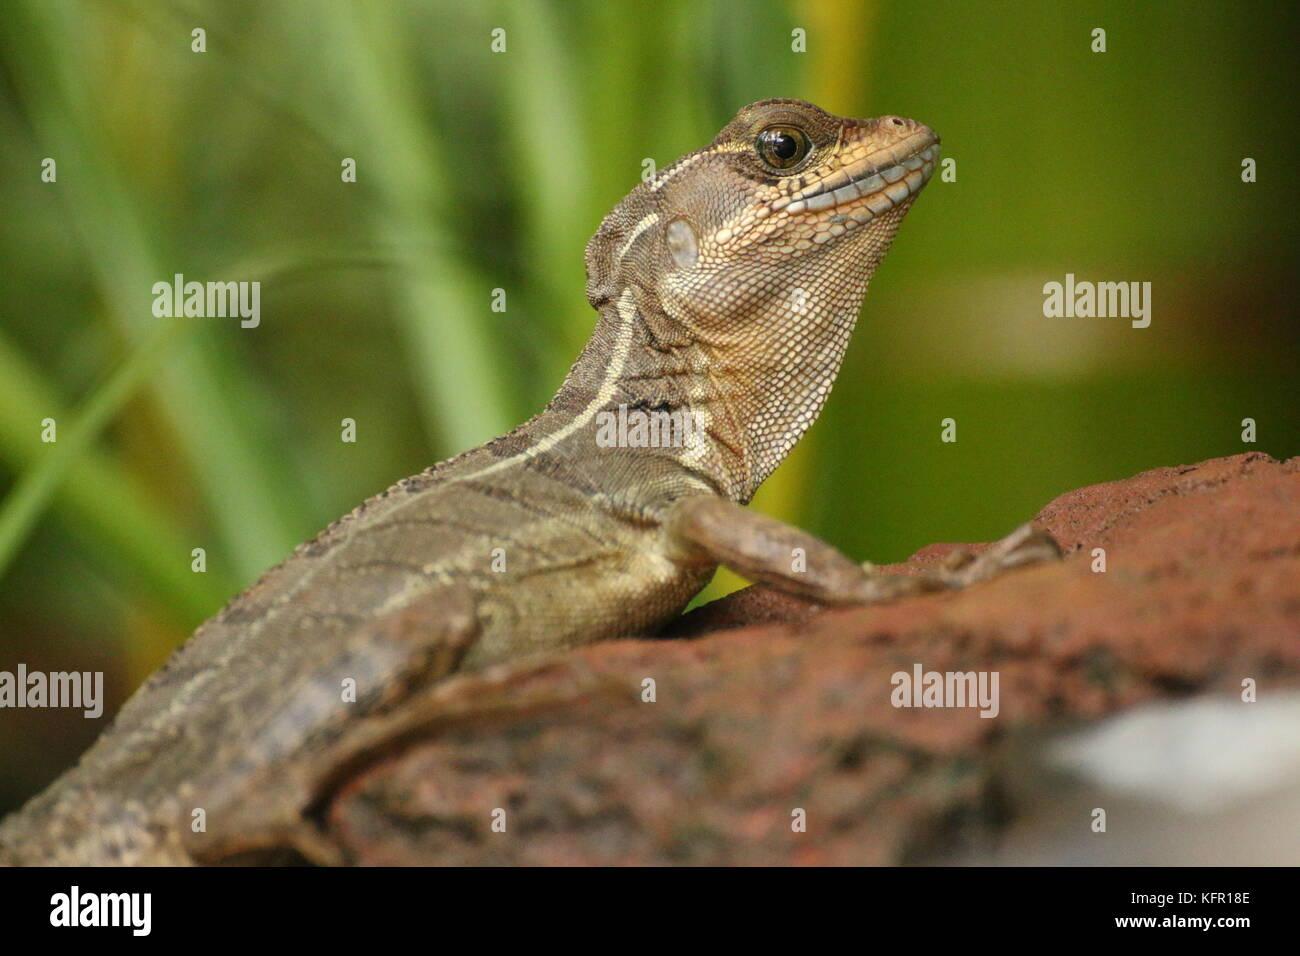 Young brown basilisk lizard (basiliscus vittatus) on rock, Costa Rica. Stock Photo